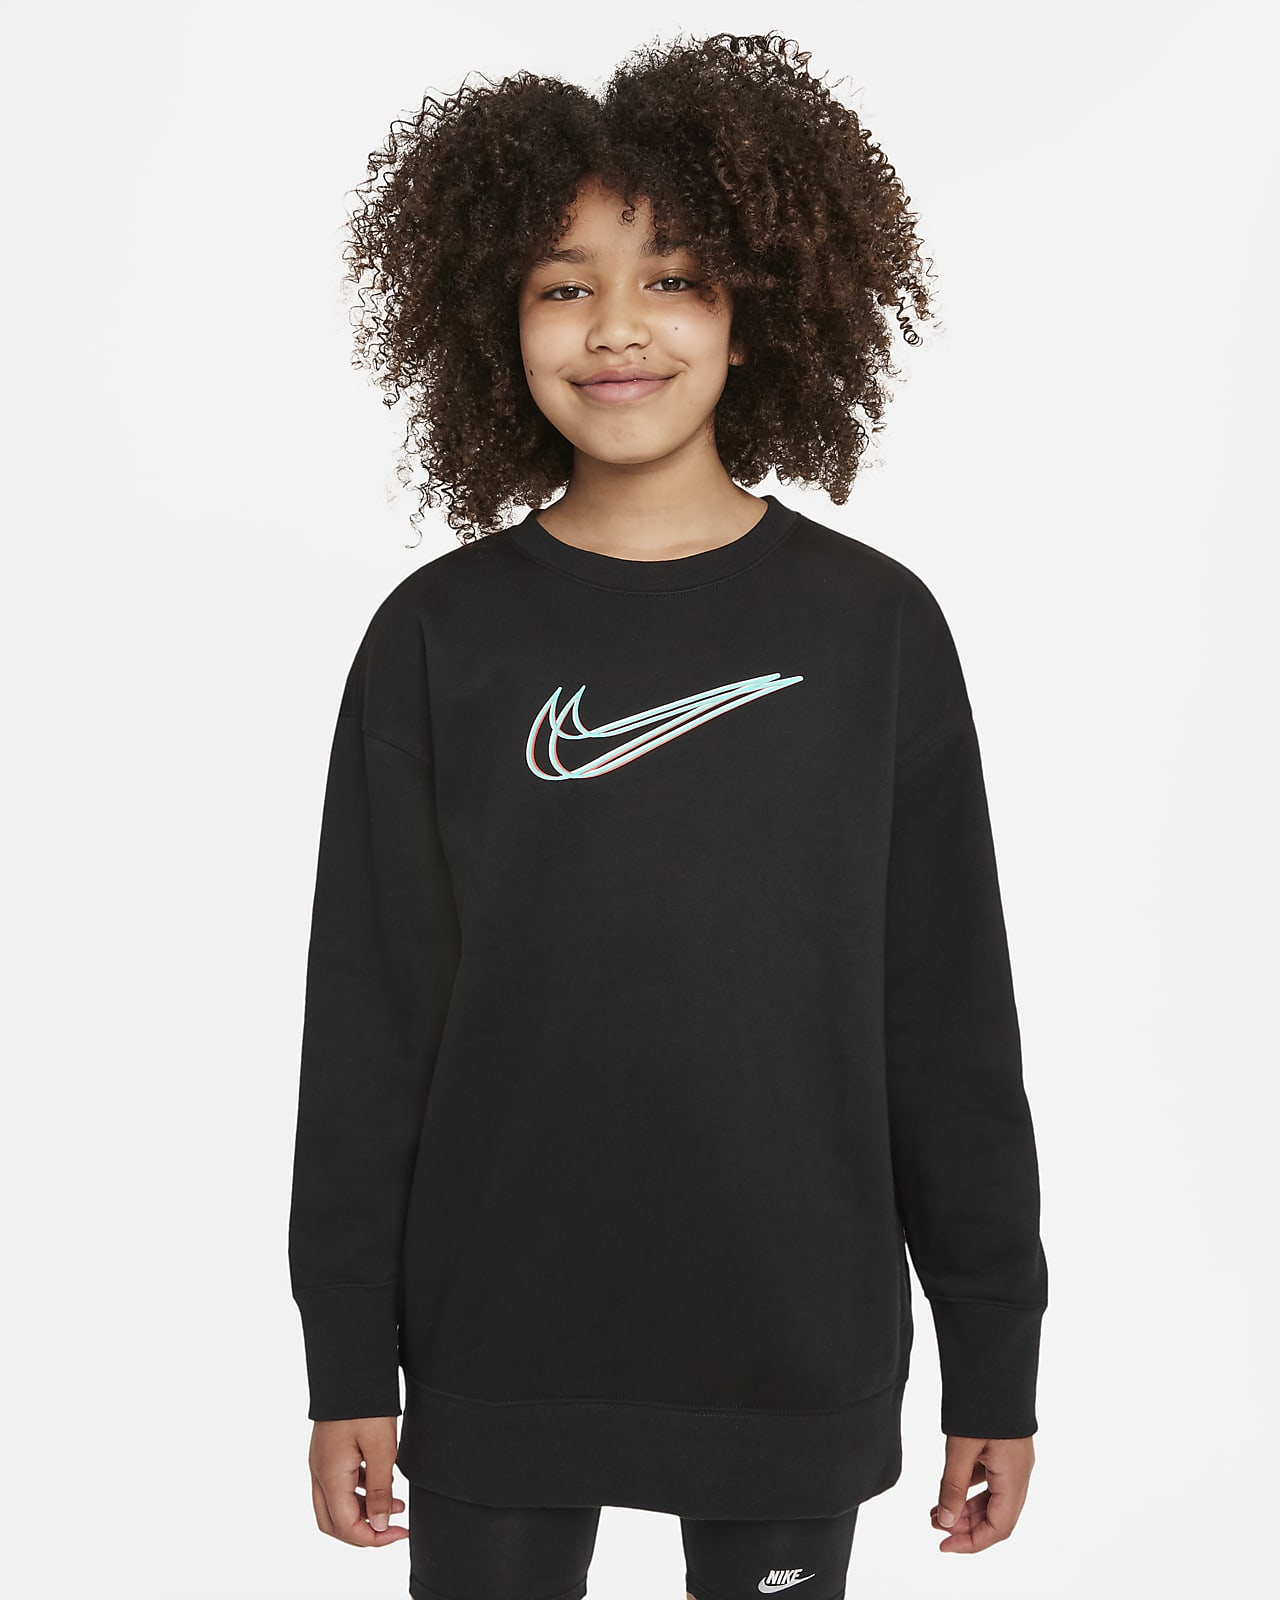 Nike Sportswear Sudadera de chándal para baile - Niña